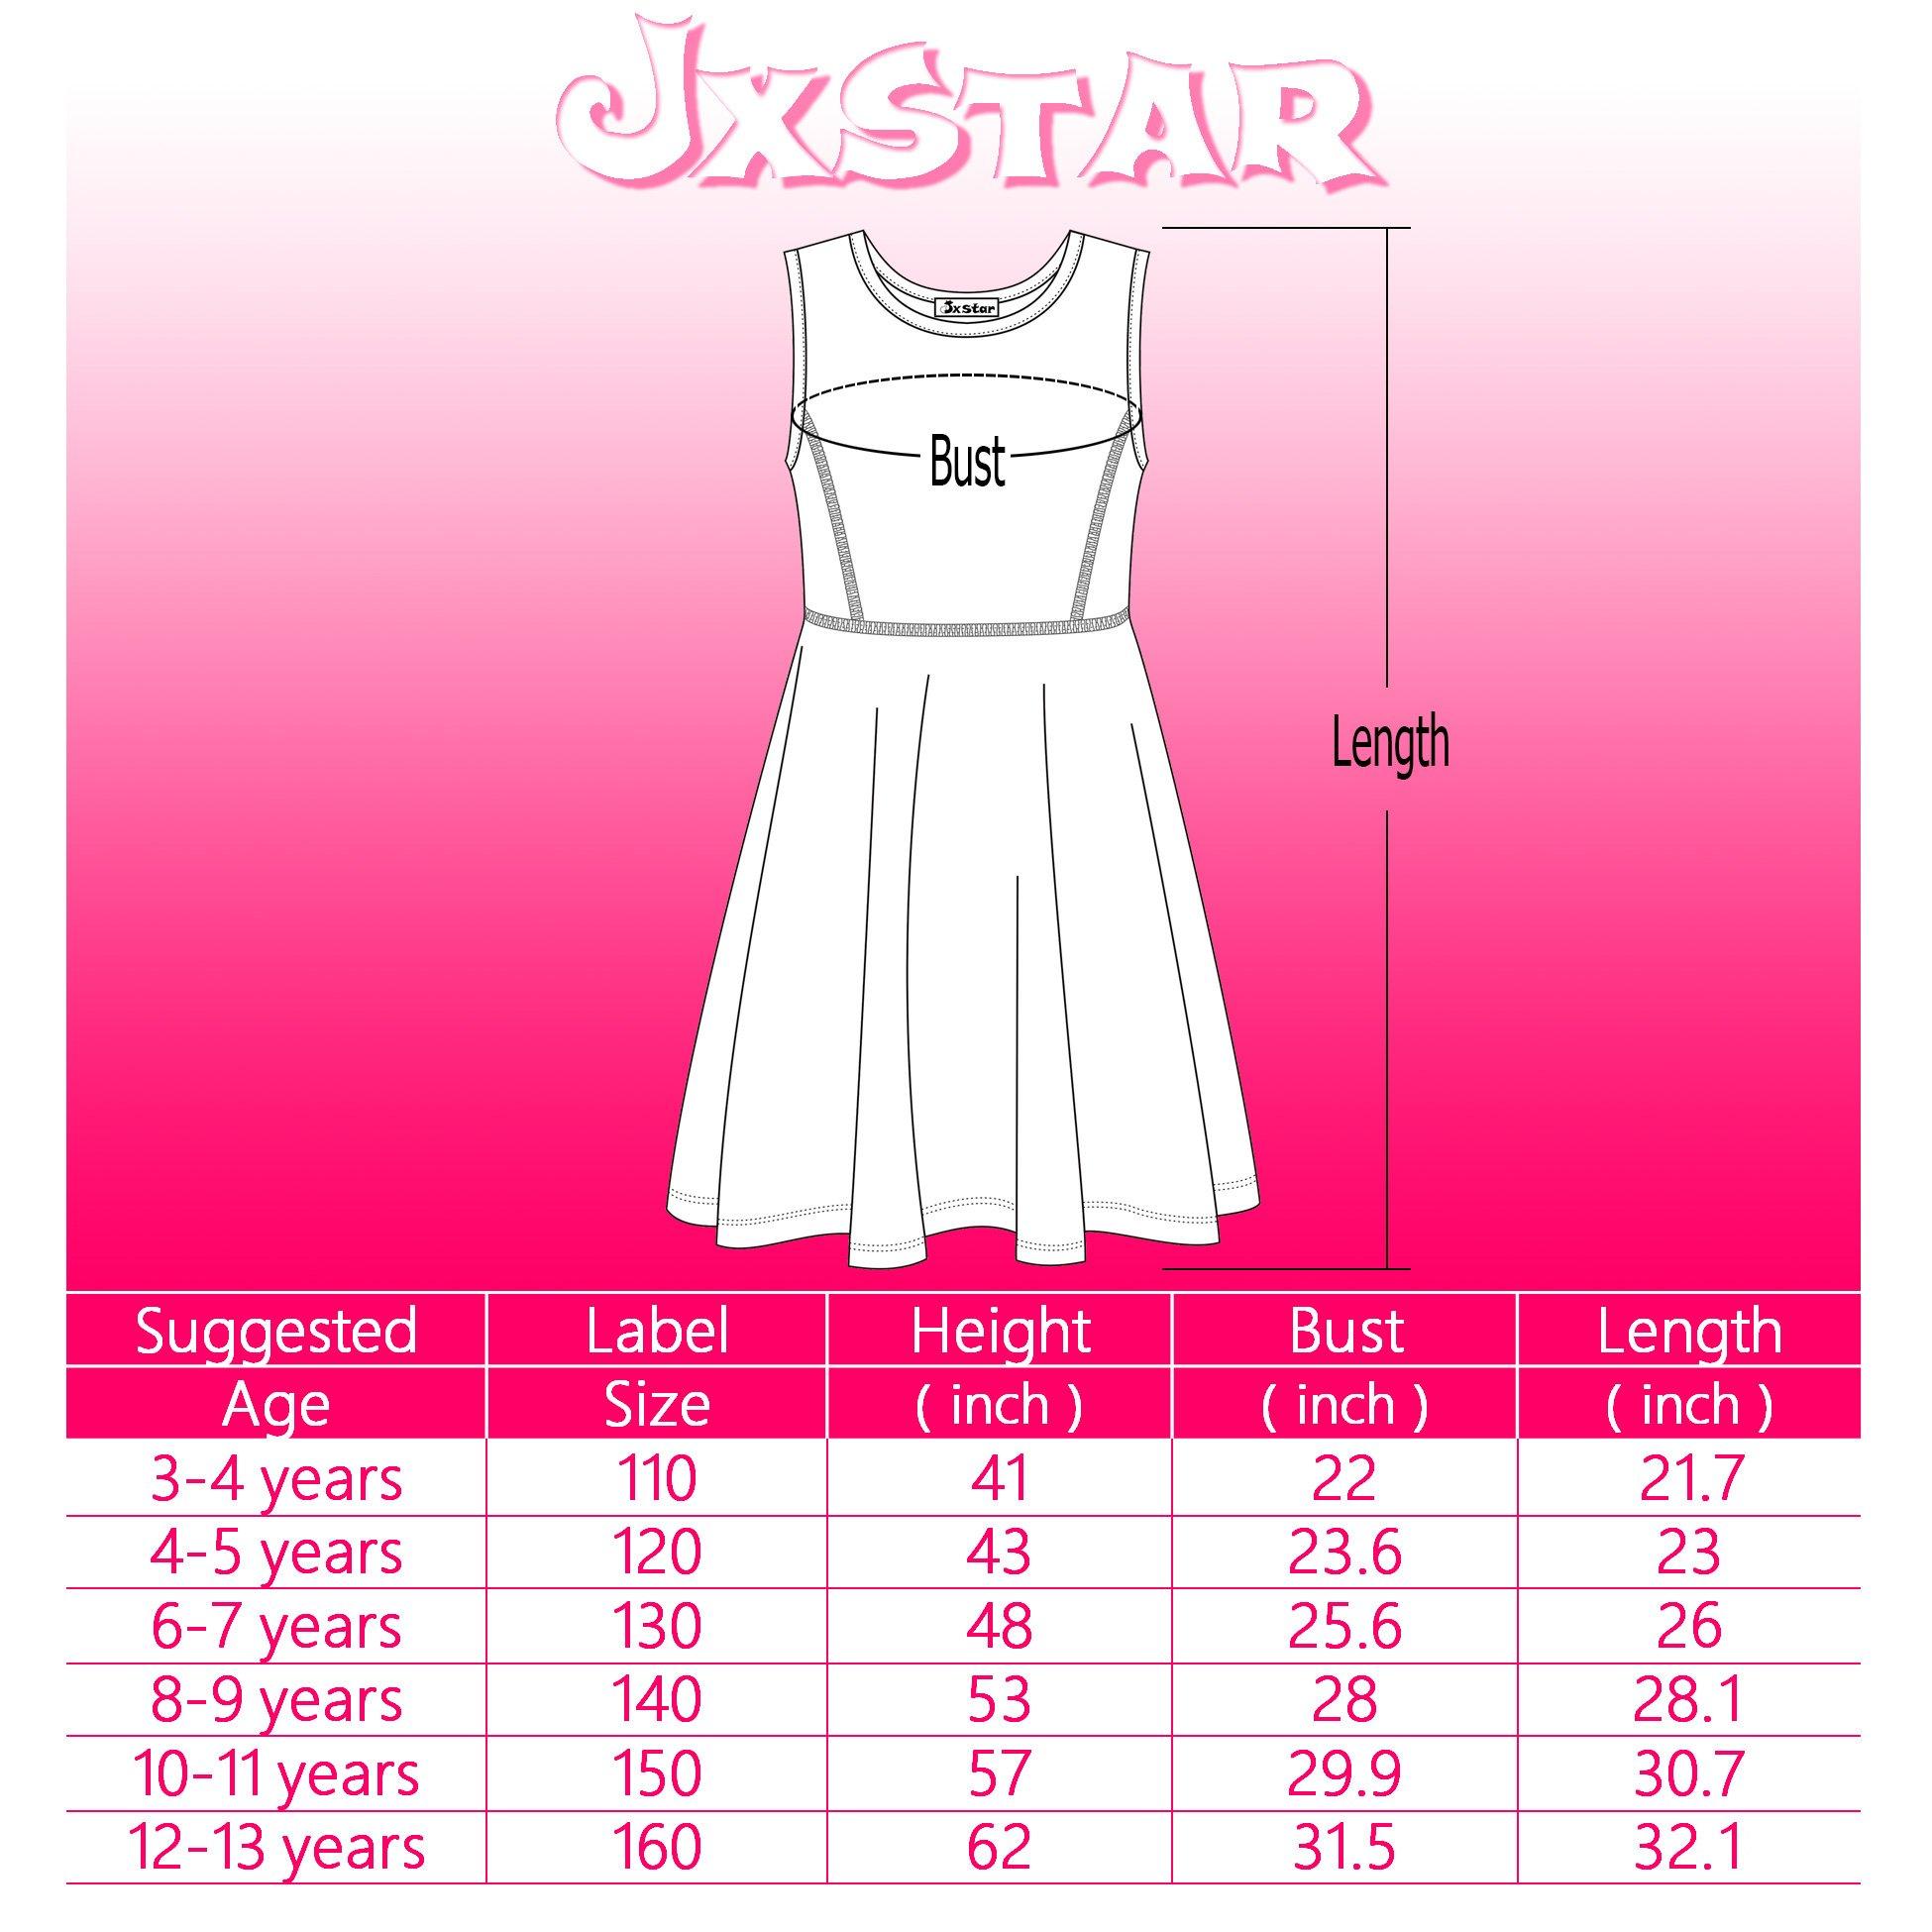 Jxstar Girl's Dress Animal Print for Skater Travel Beach Pattern Long Sleeve Dress Cat 160 Cat Fall 12-13Years Height 62in